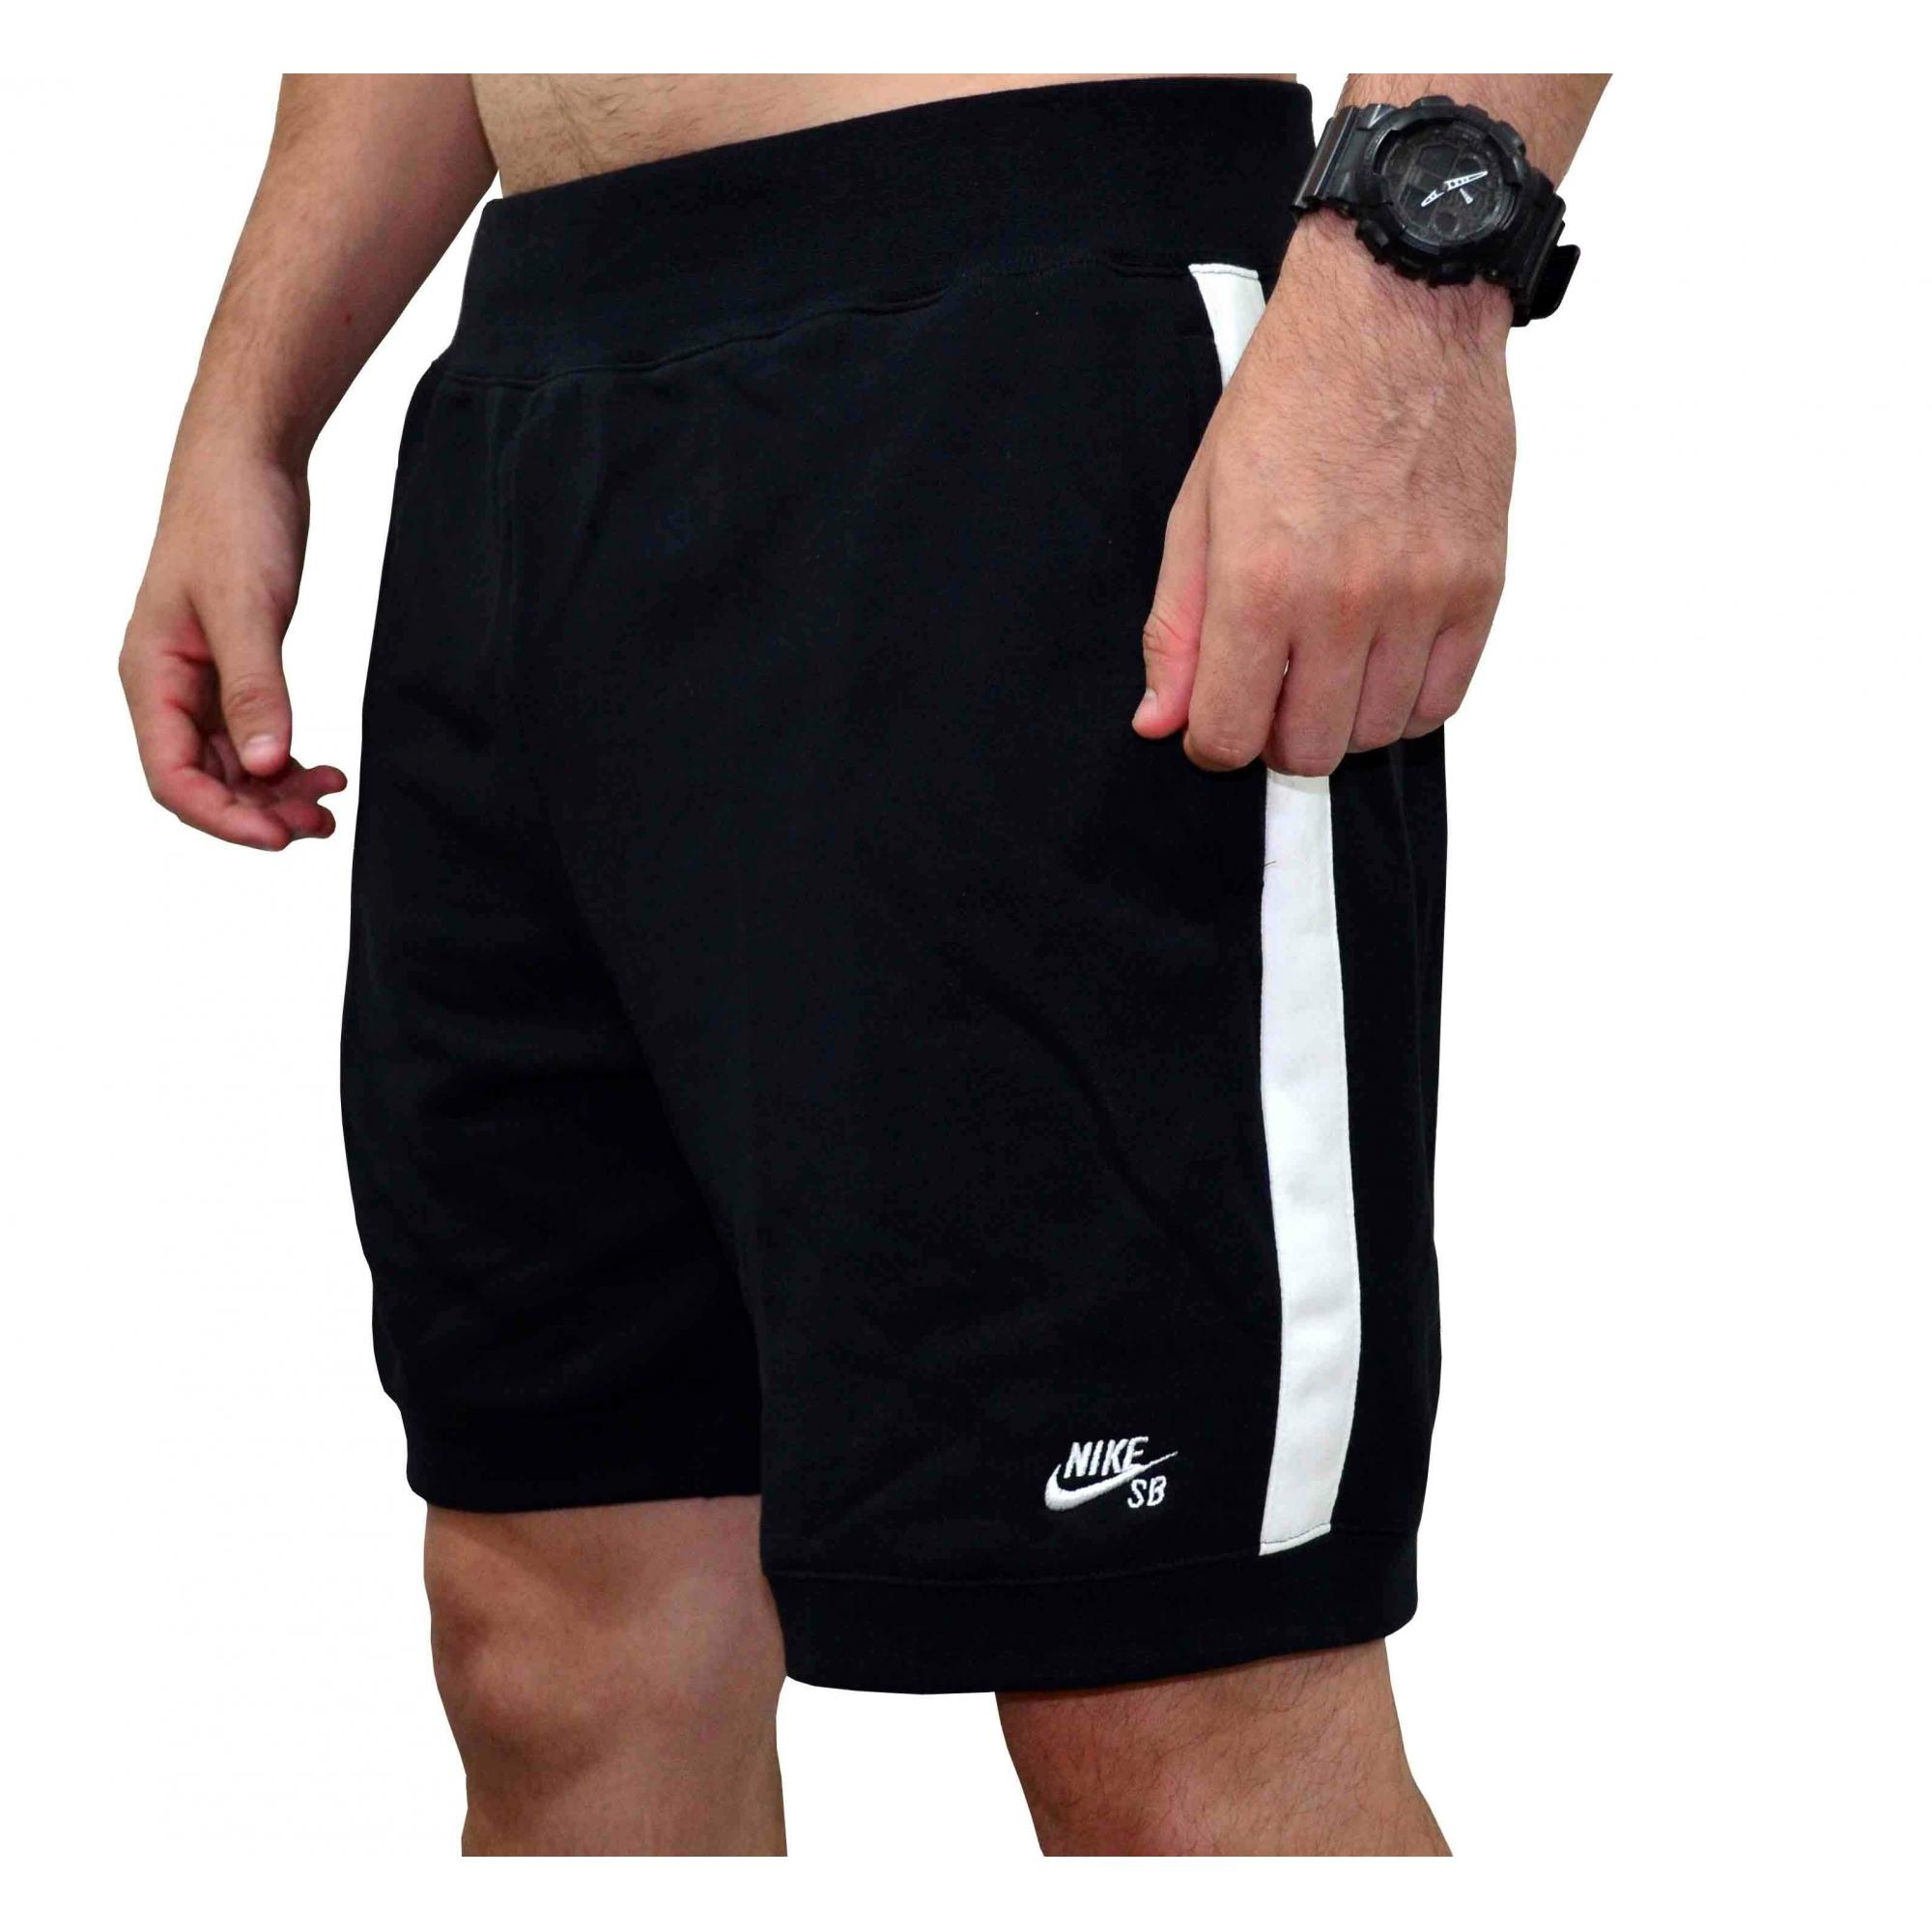 Bermuda Nike SB Y2K Fleece - Preto